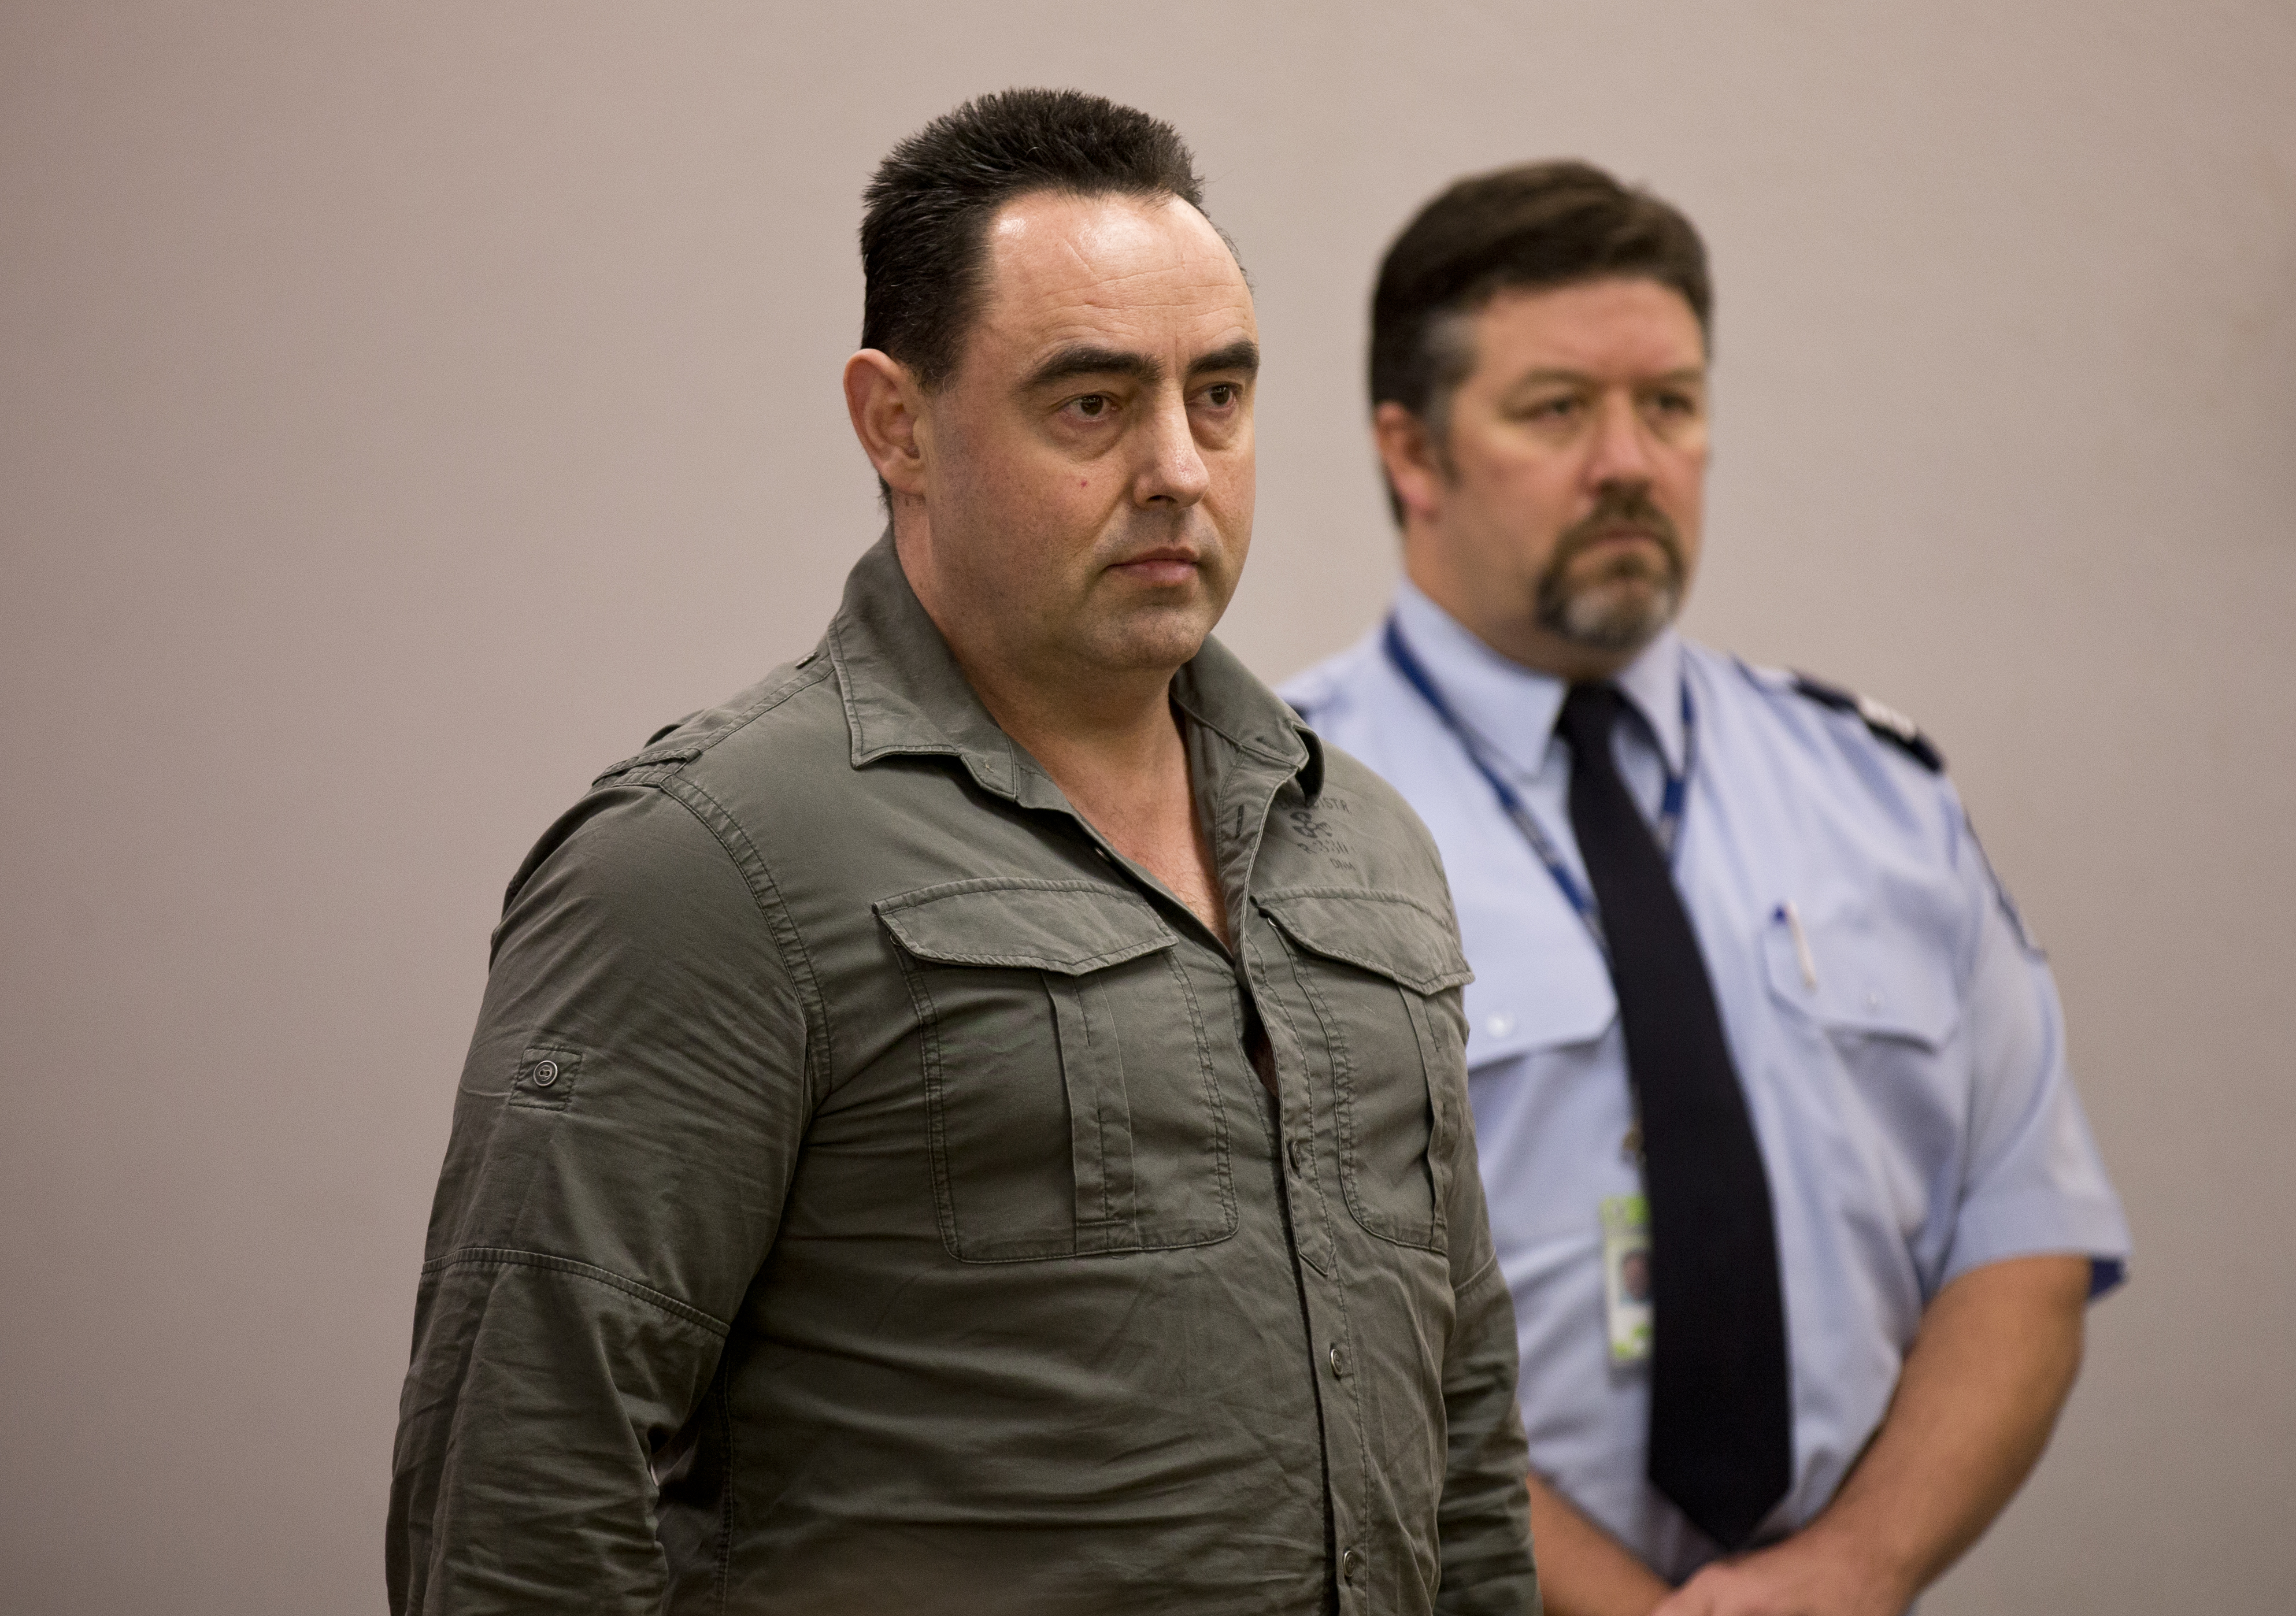 Steroid dealing bodybuilder loses house - NZ Herald